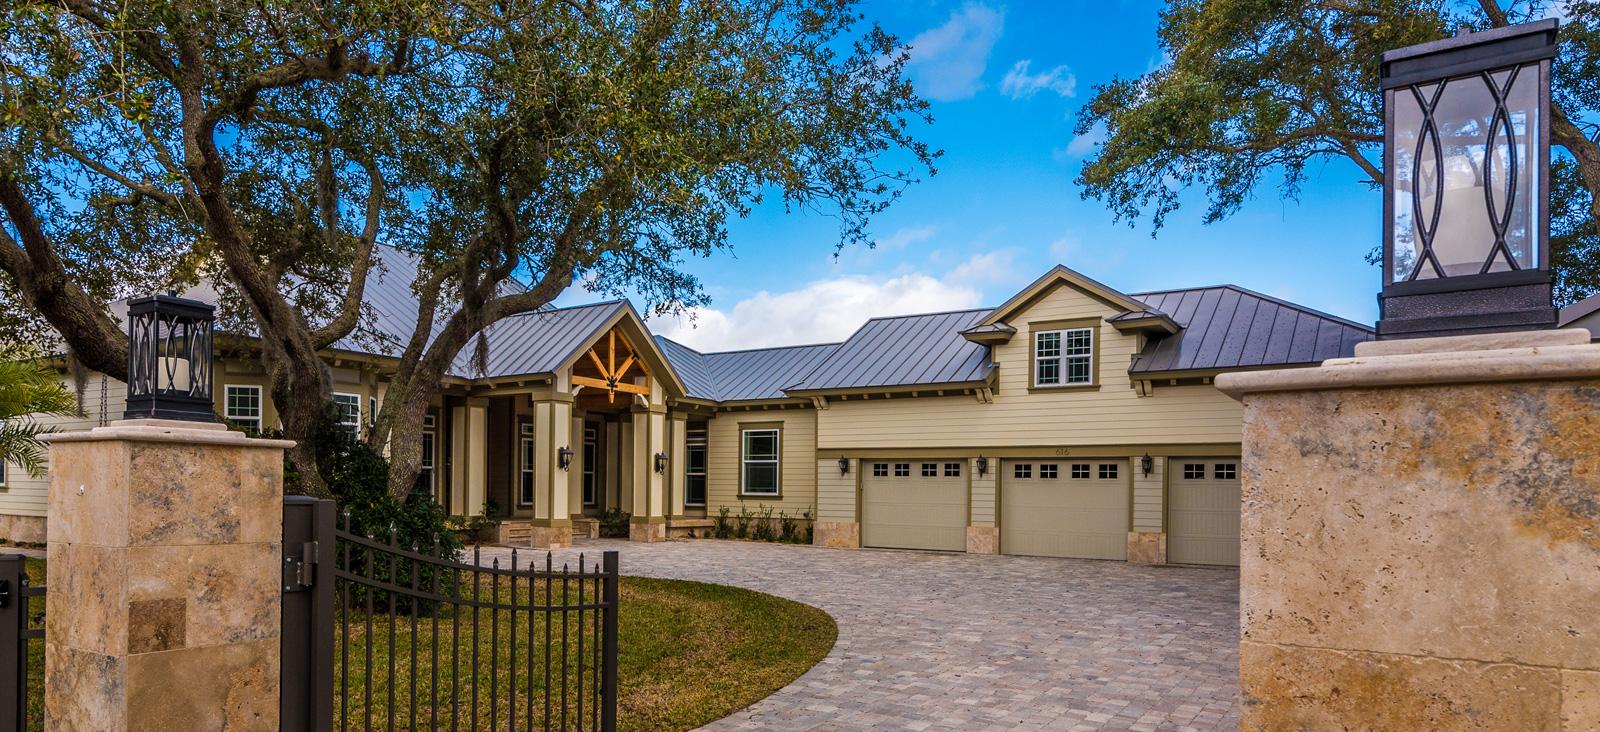 Generation homes custom home builder in ne florida